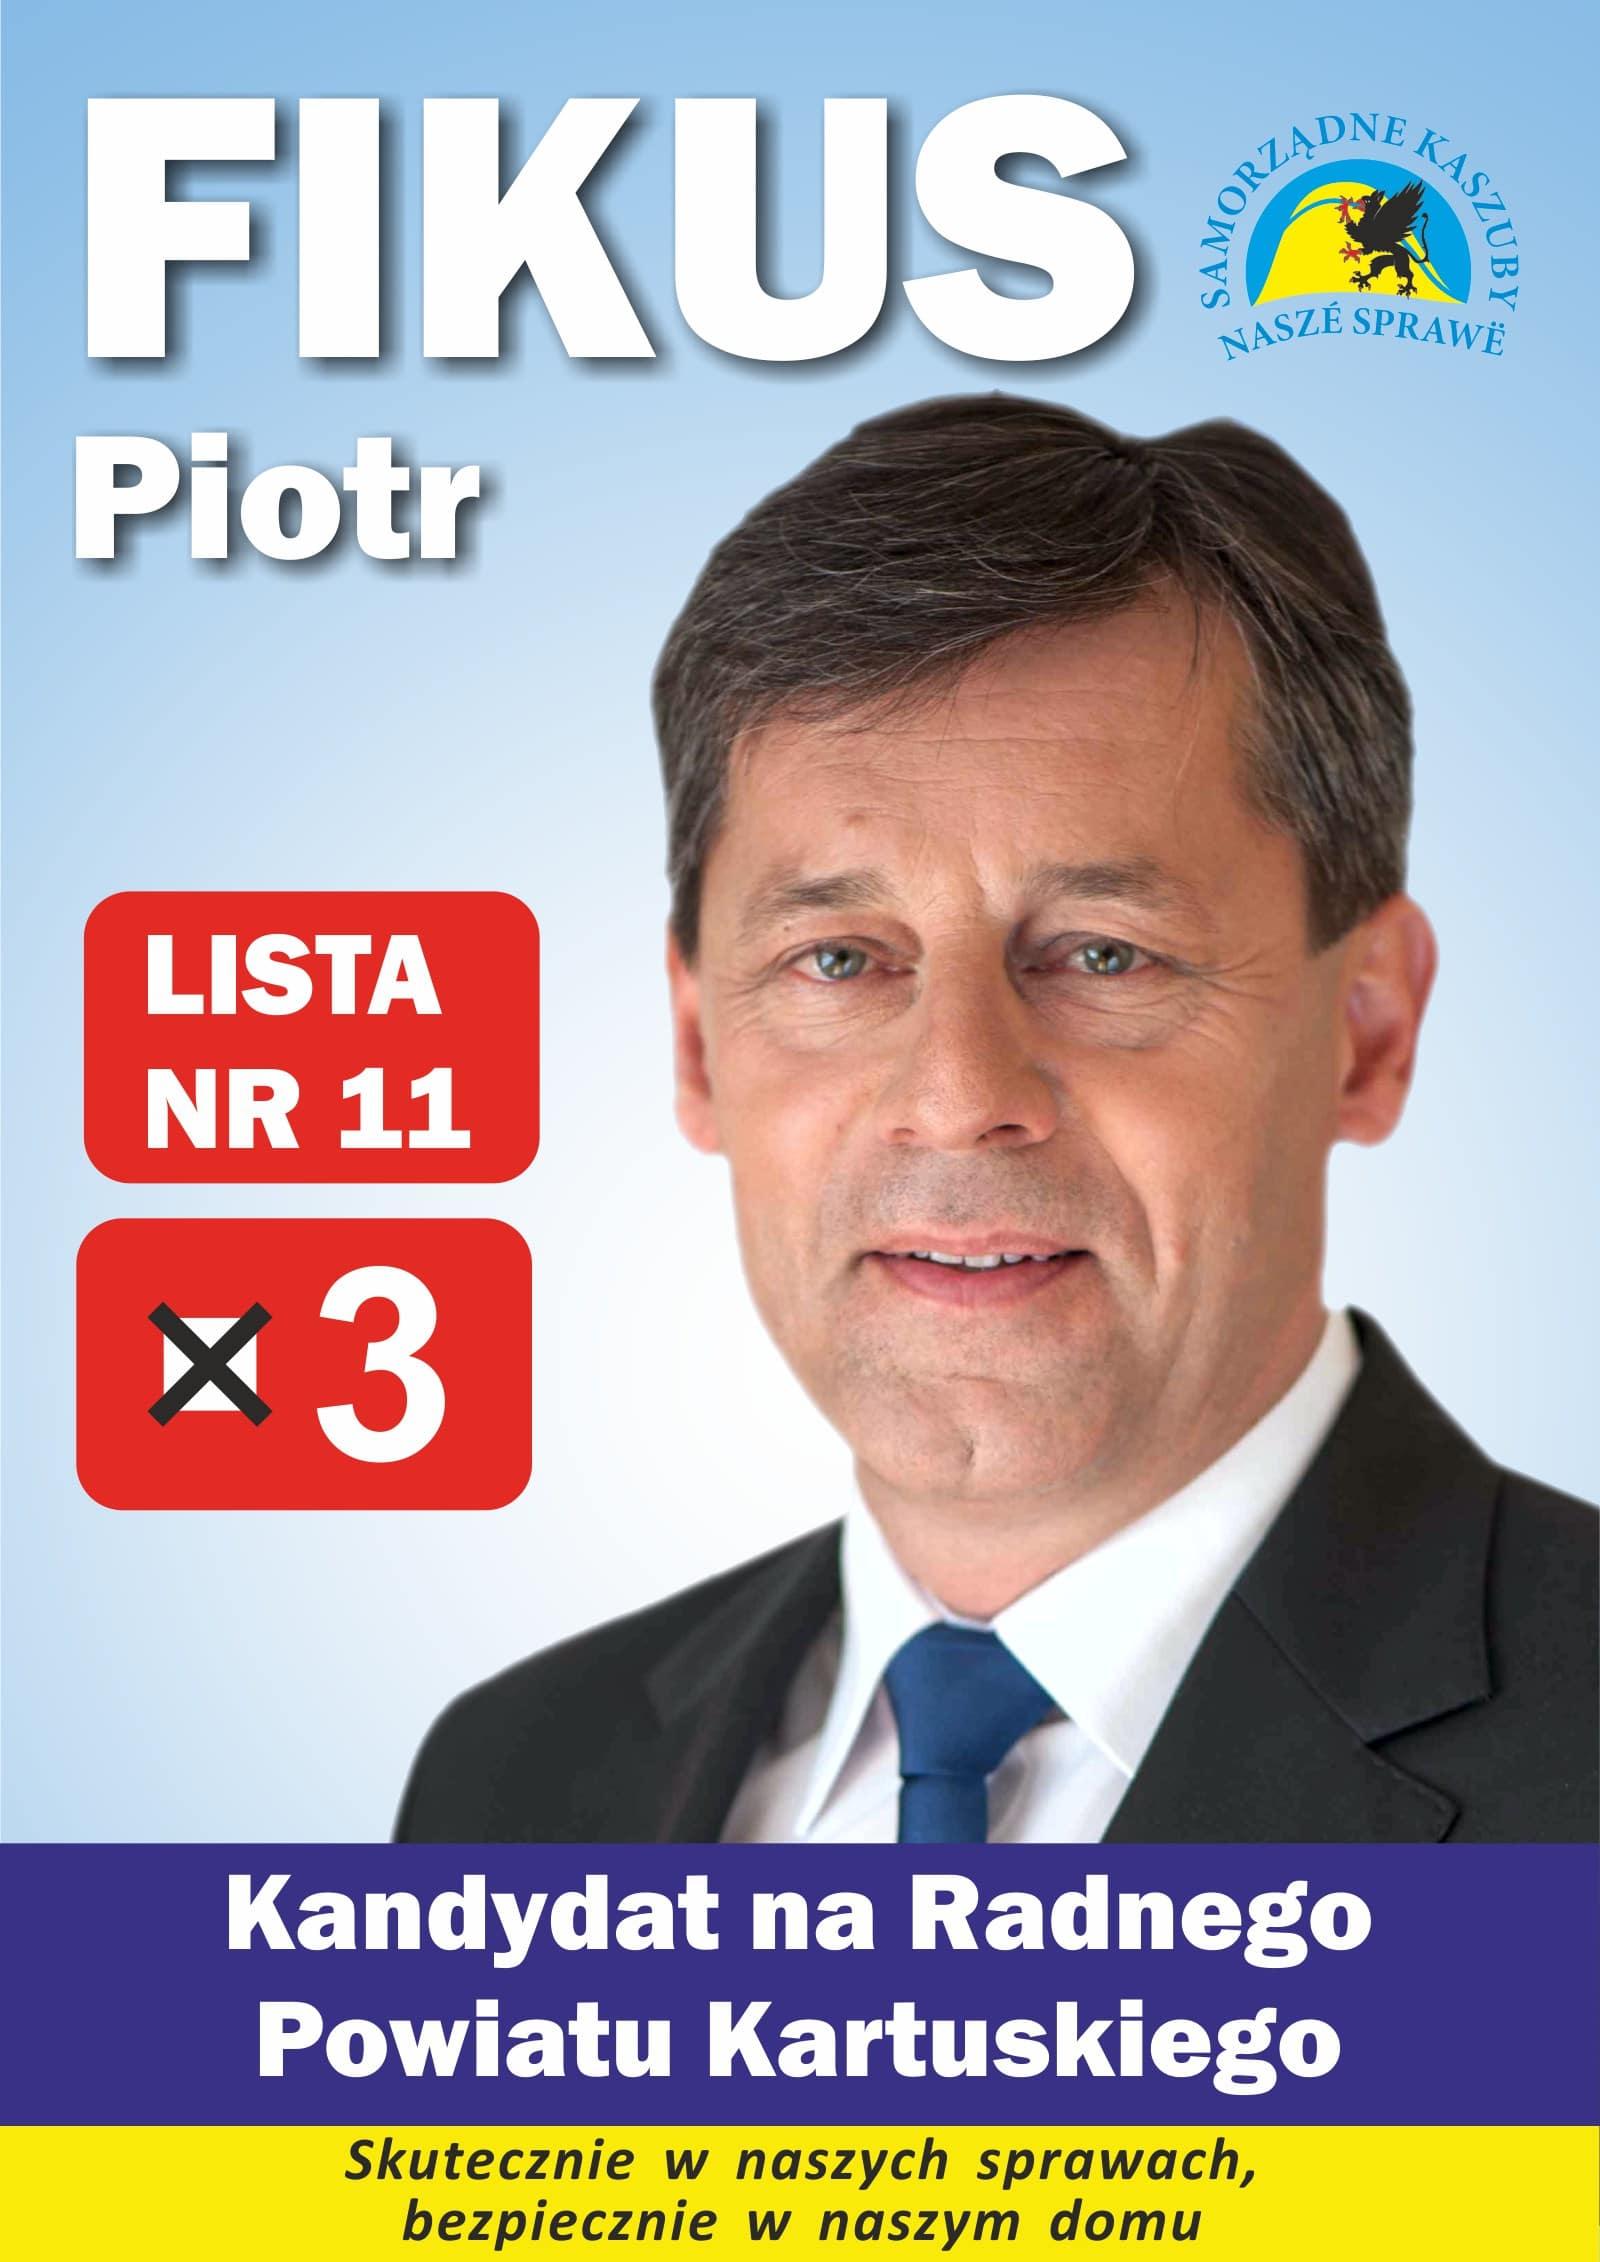 wybory piotr fikus